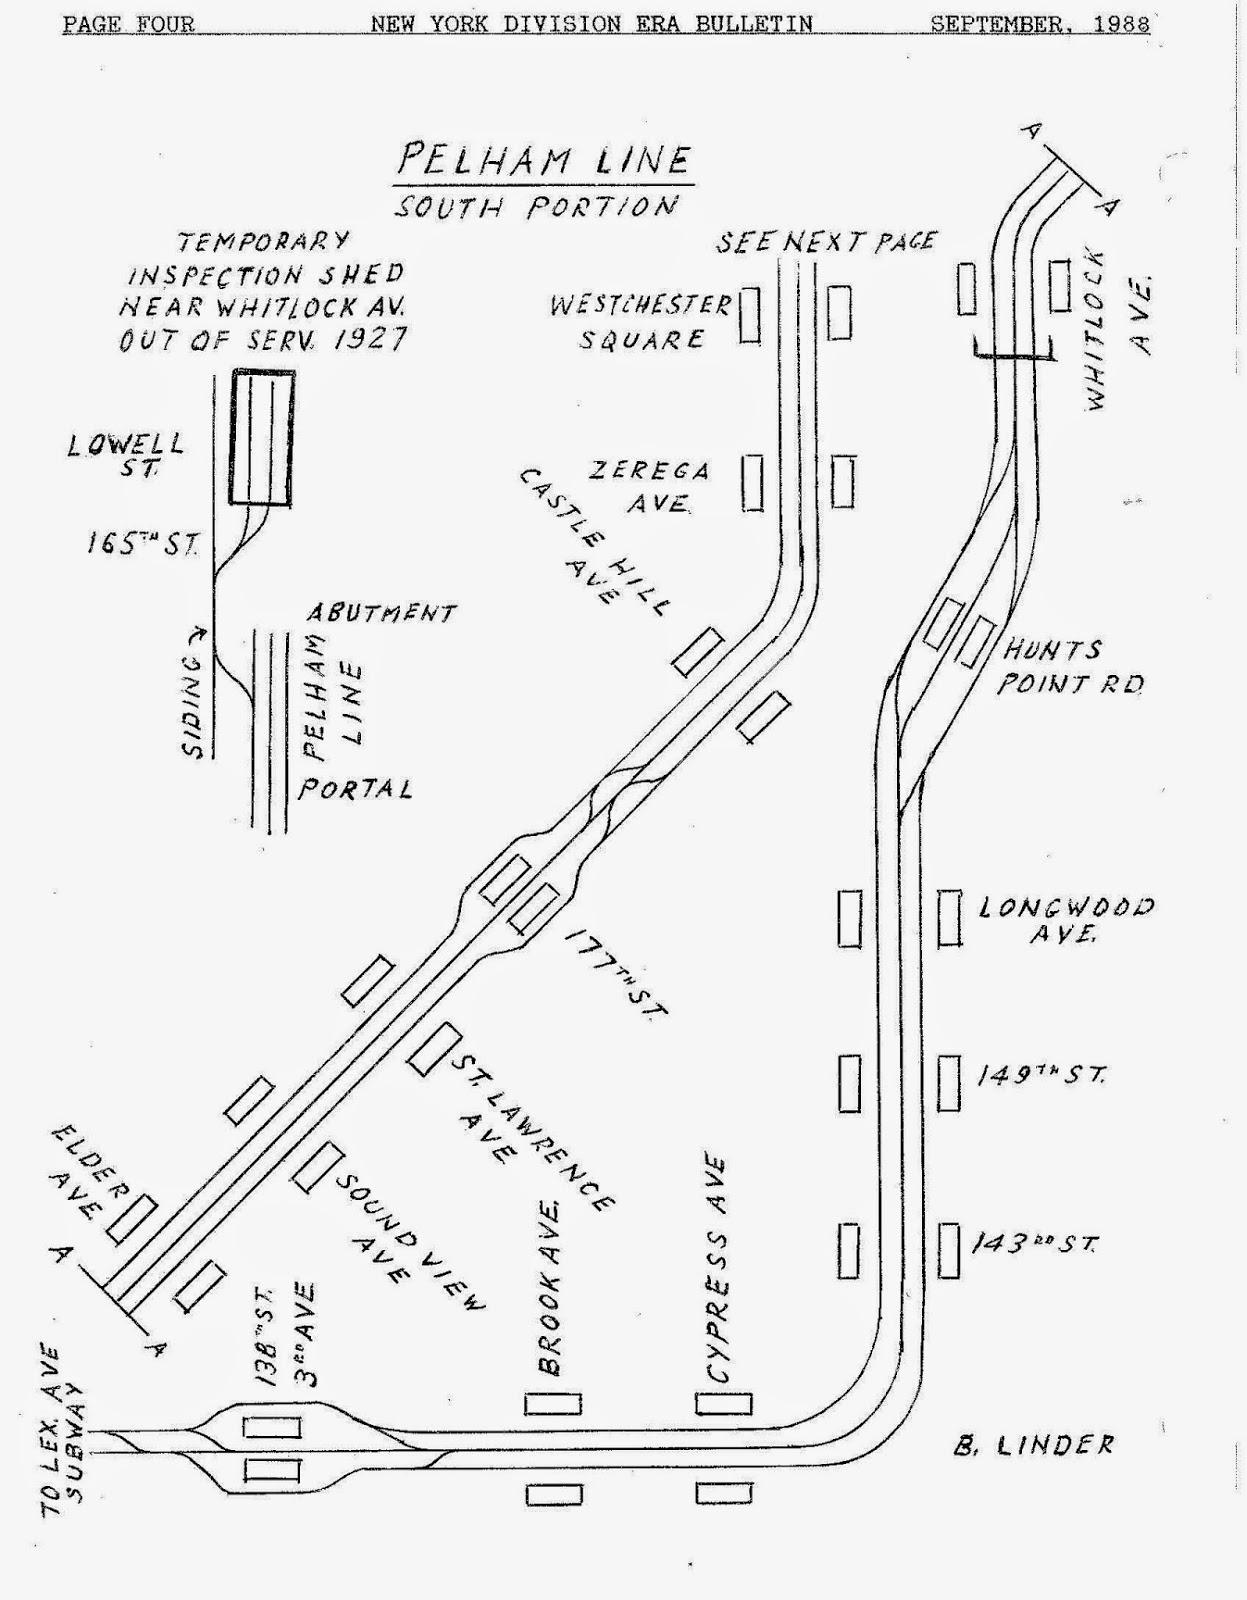 Pelham subway line track plan as of 1988